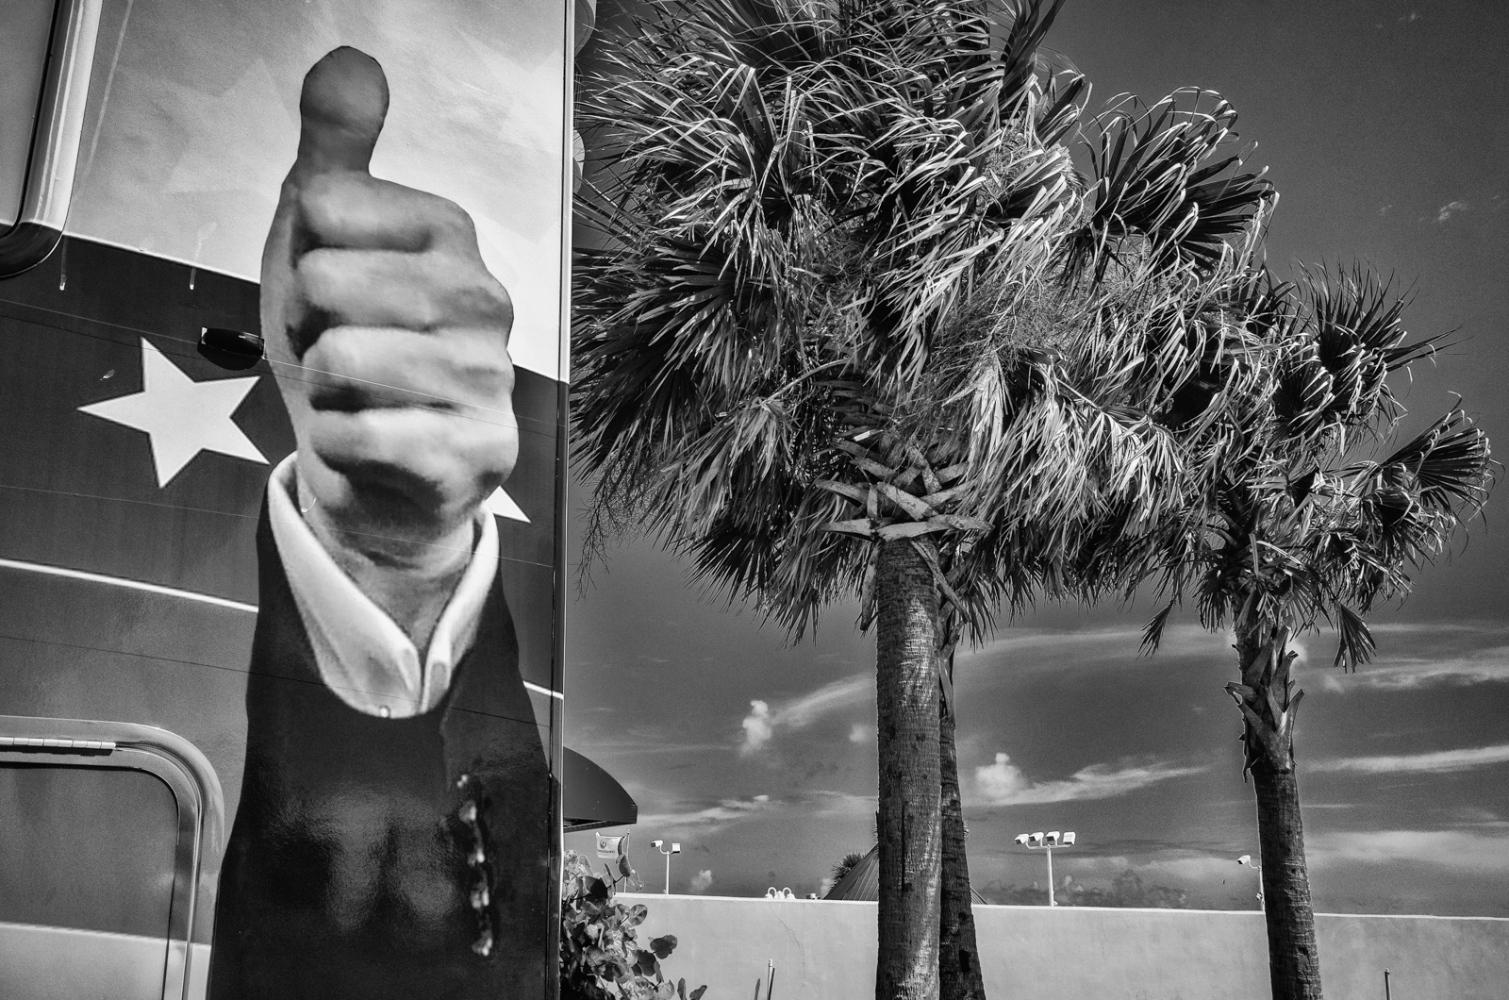 Trunp Thumb Campaign Truck, Daytona Beach